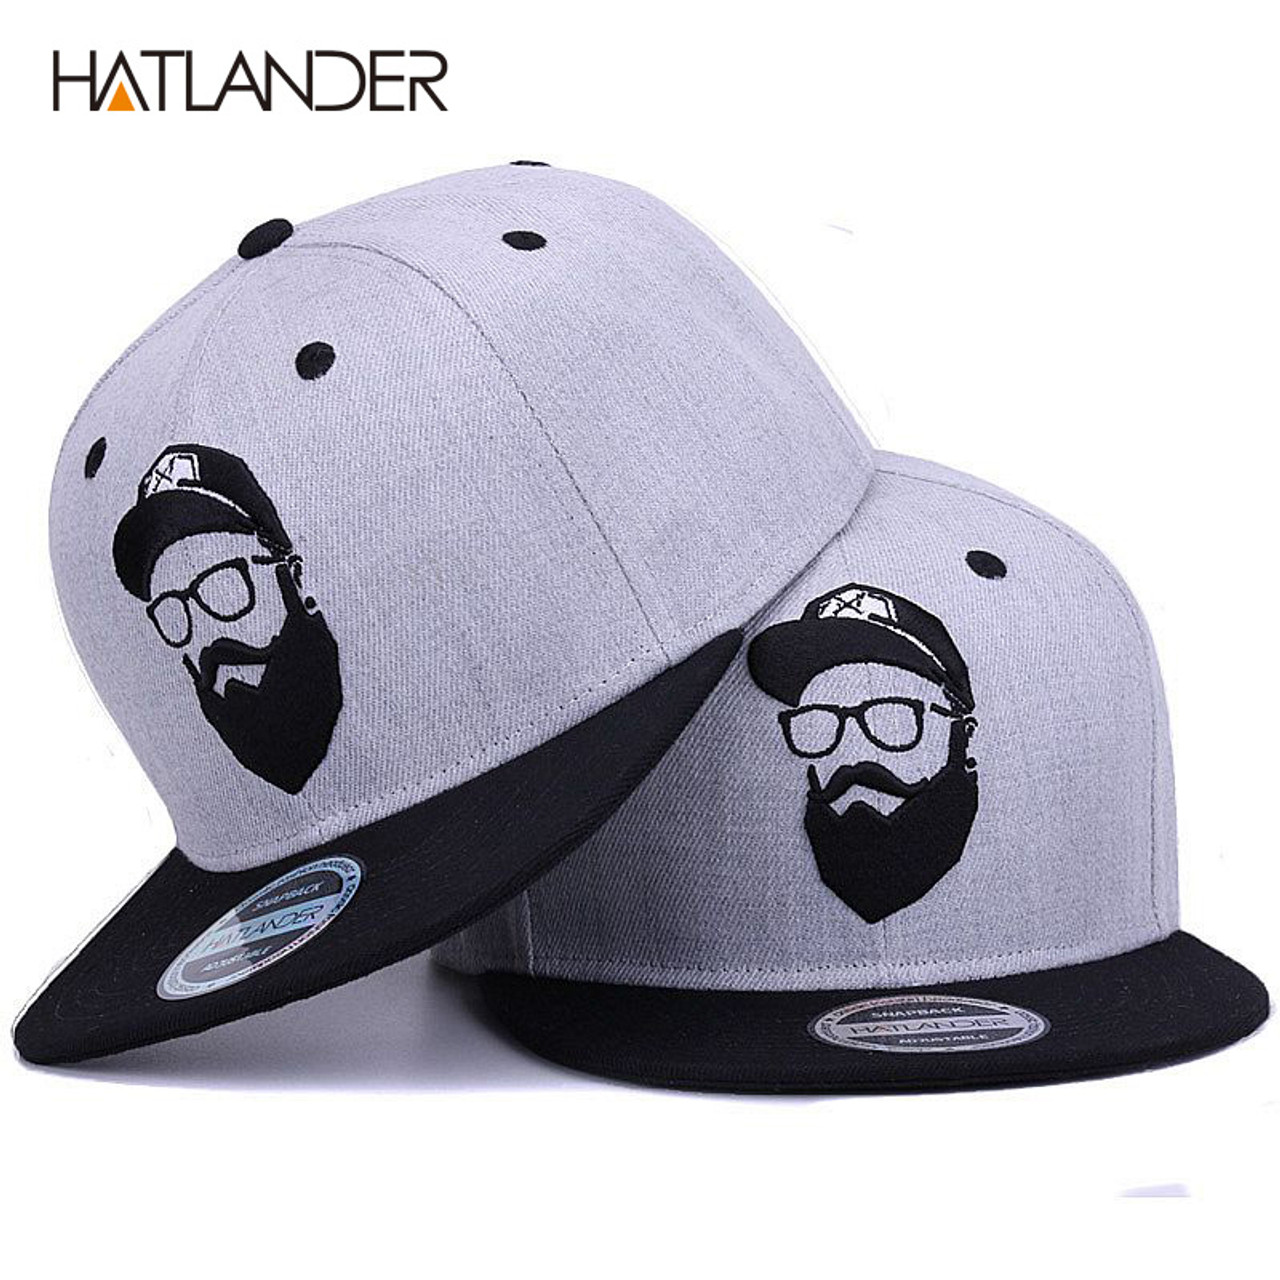 HATLANDER Original grey cool hip hop cap men women hats vintage embroidery  character baseball caps gorras planas bone snapback - OnshopDeals.Com 94bab383af2f